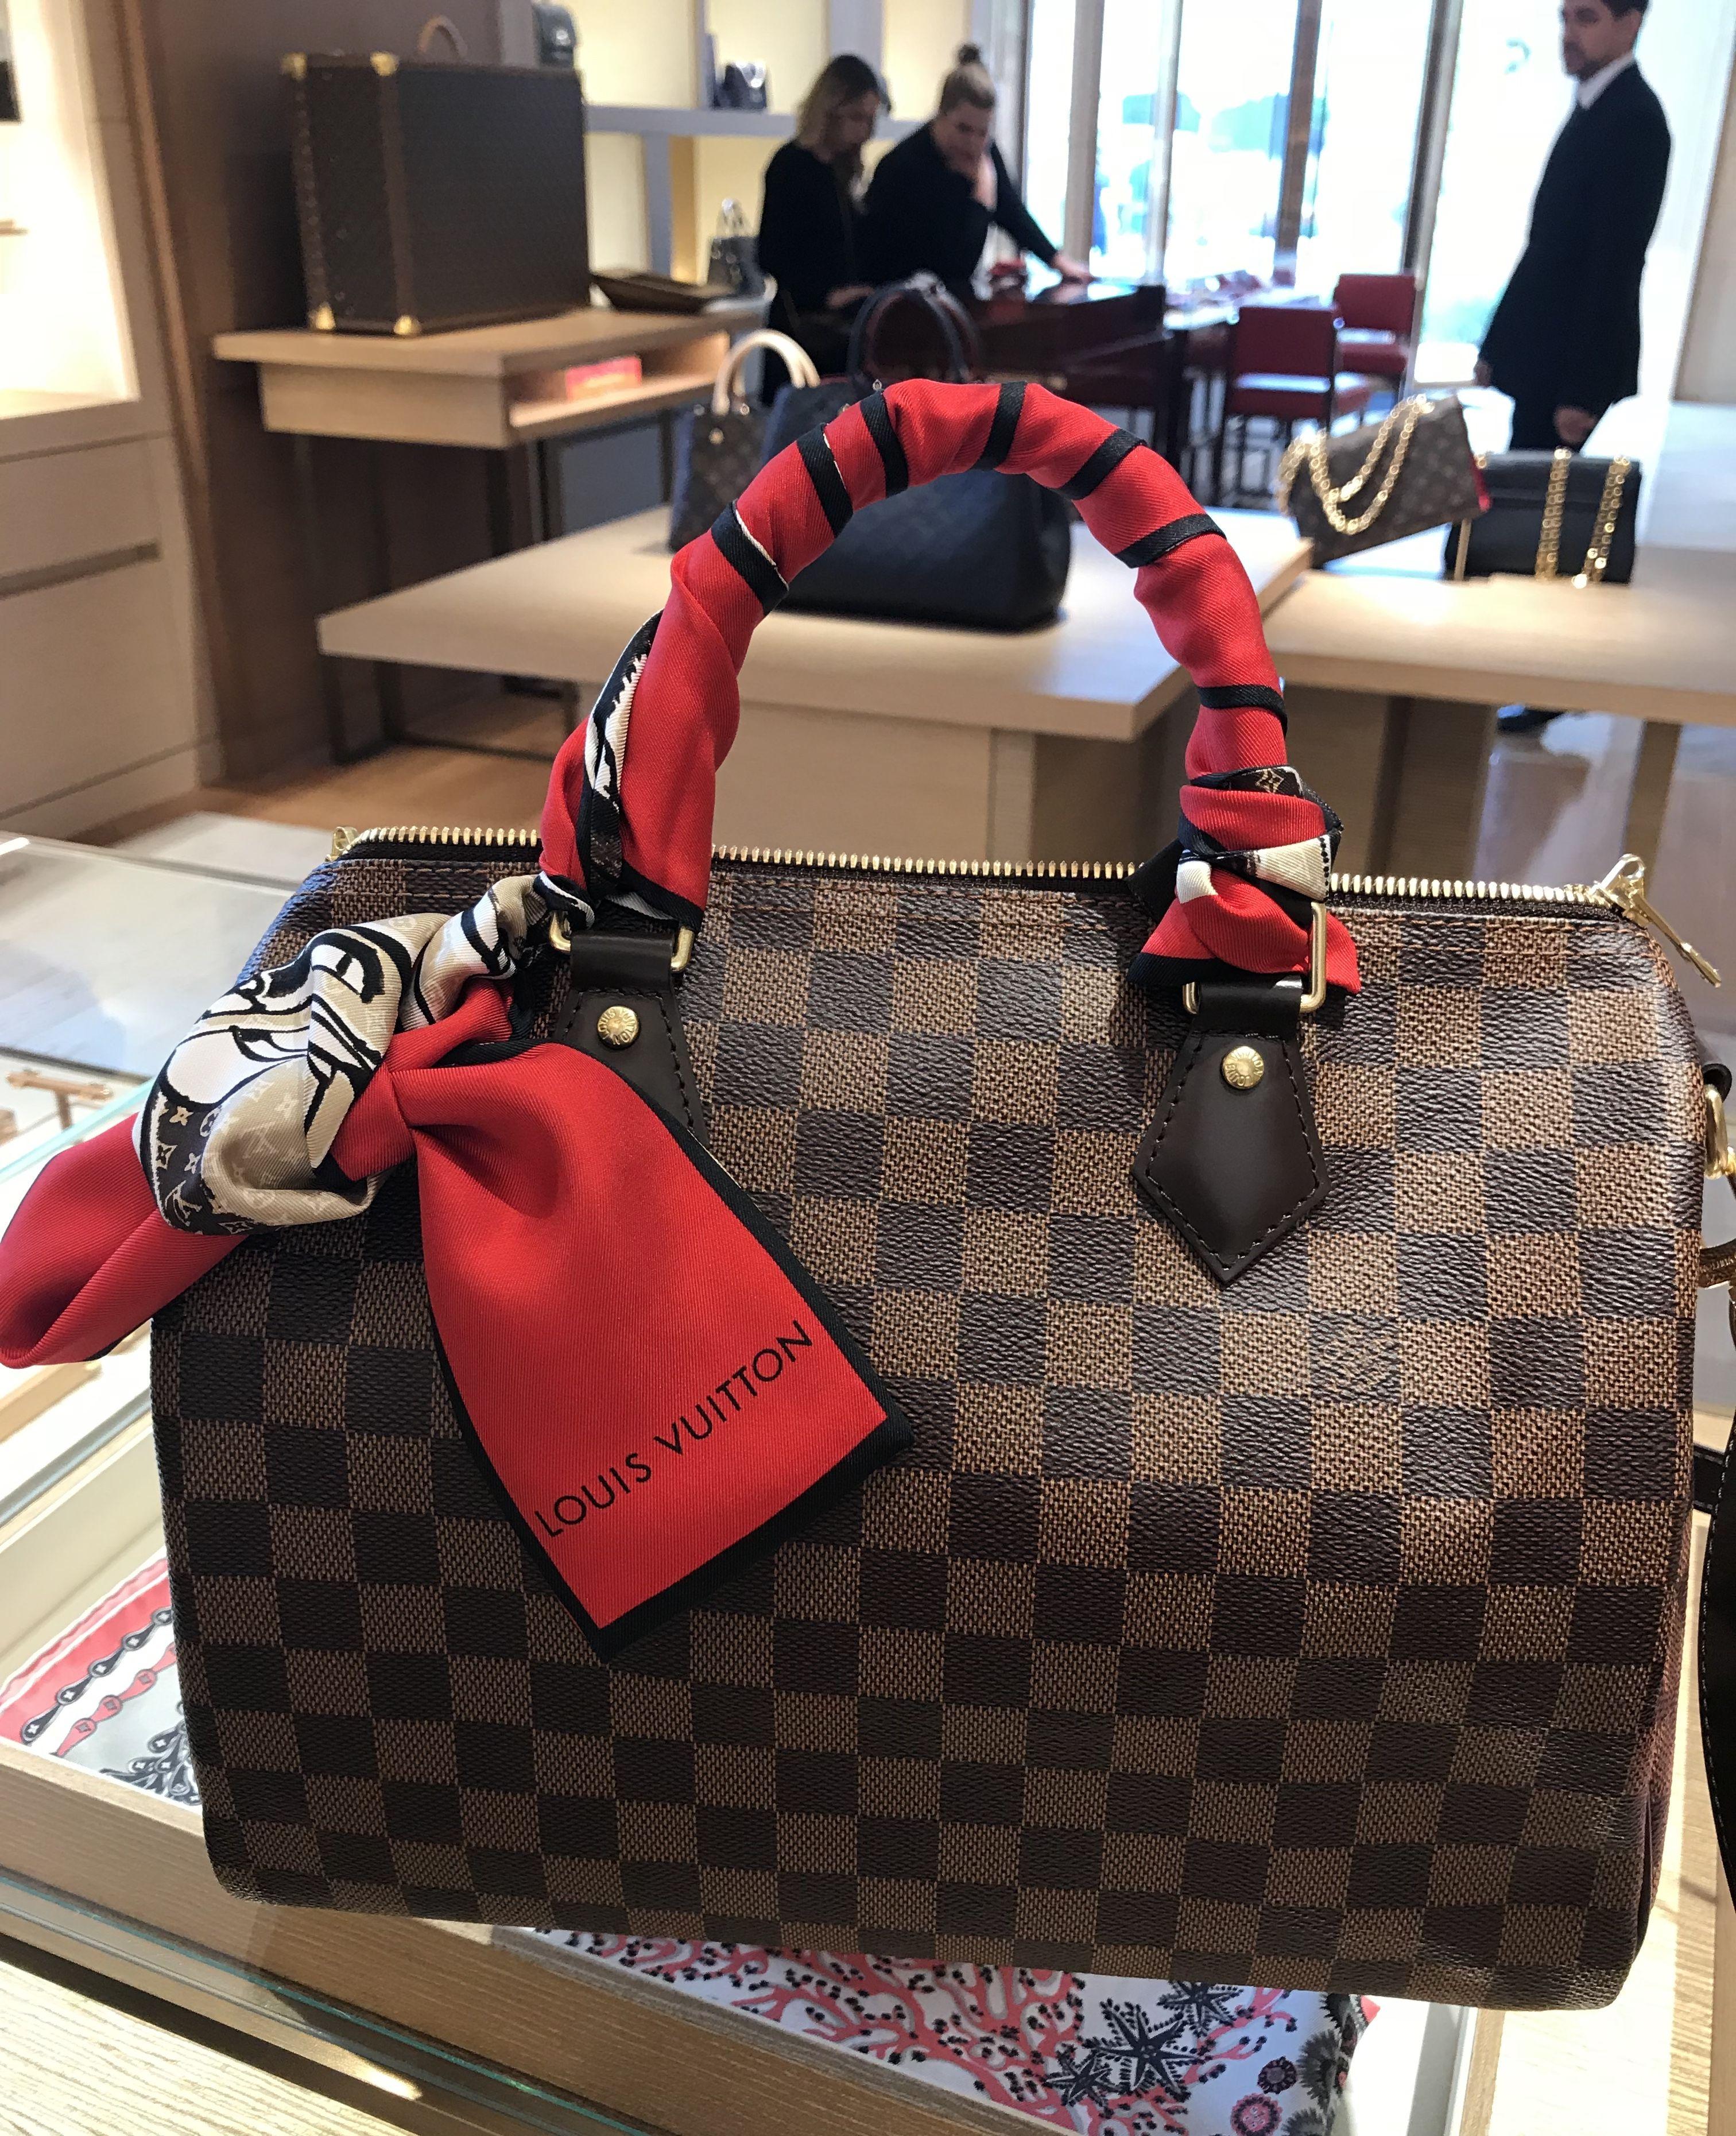 9afd29b83ba Louis Vuitton Speedy Bandouliere 30 Damier Ebene | Clothes and ...